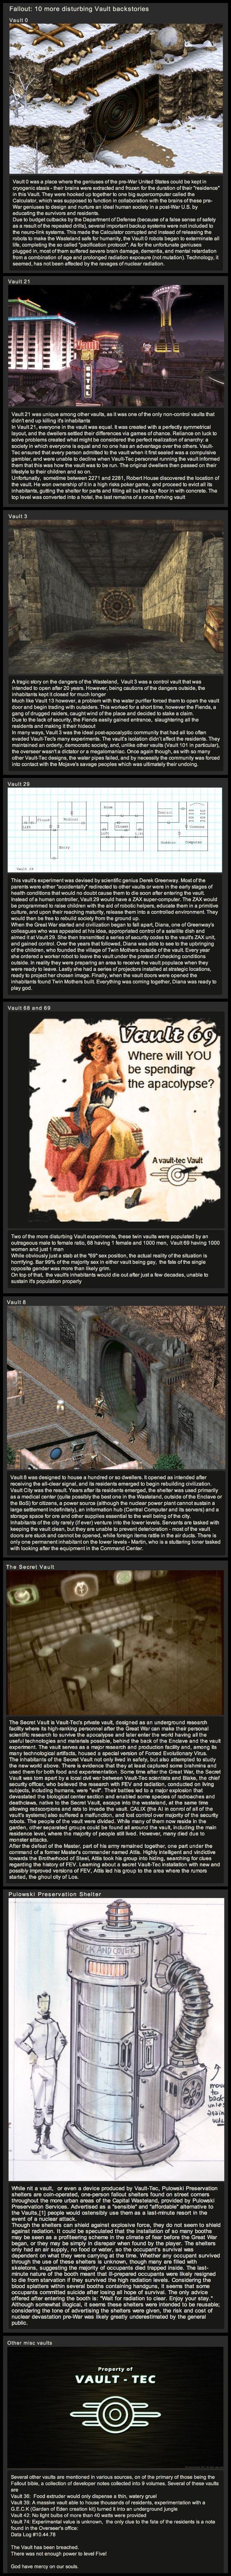 10 Disturbing Fallout Vault Backstories: